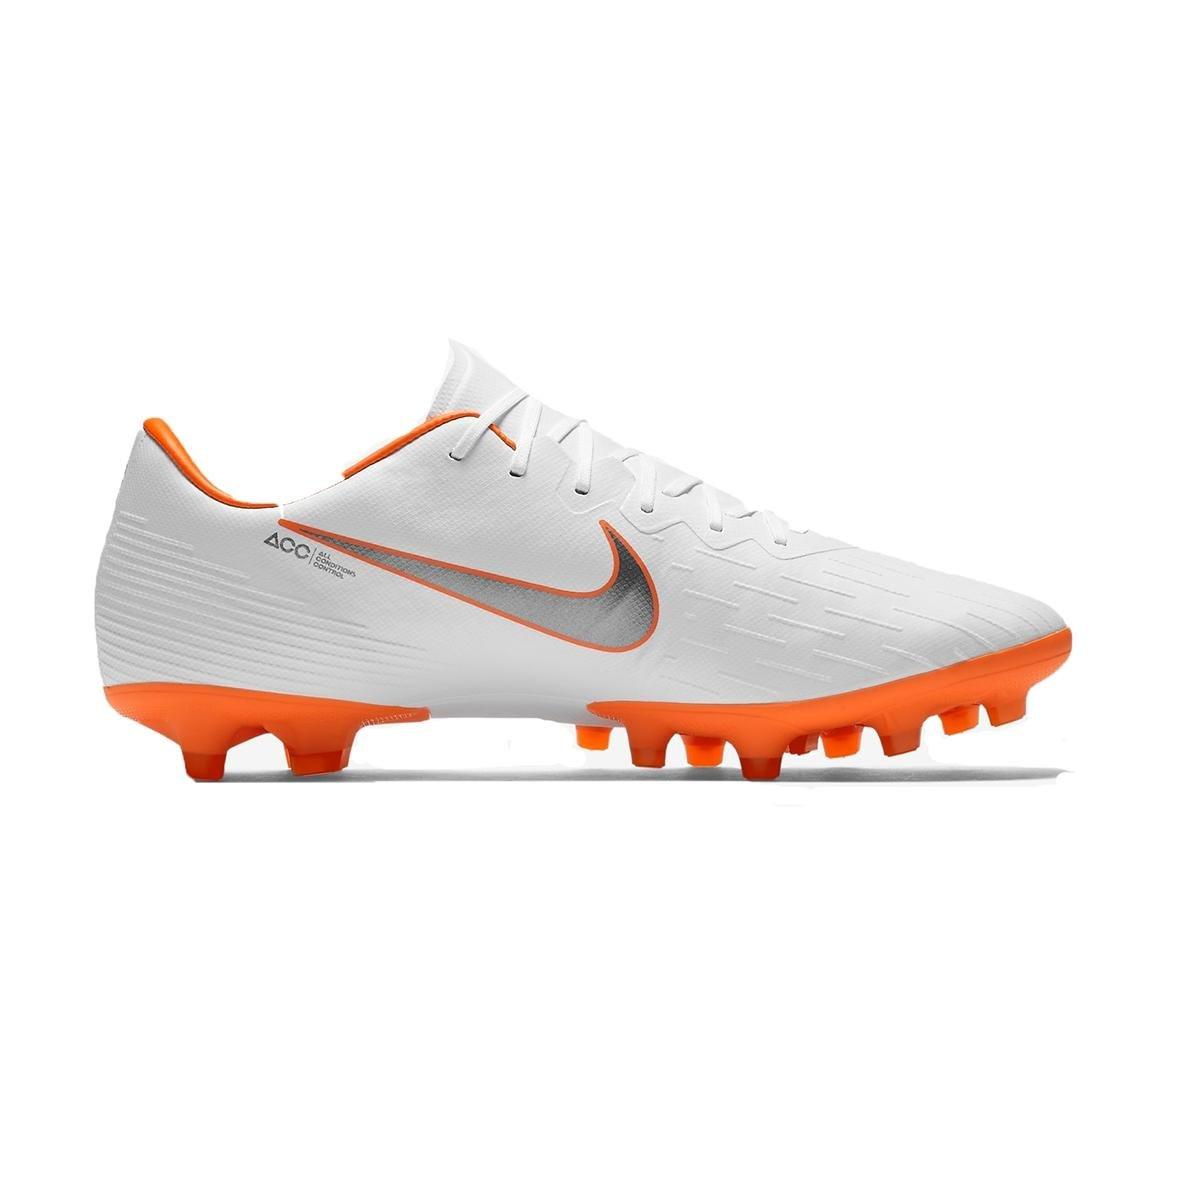 Nike Fußballschuh Mercurial Vapor 12 AG PRO, Scarpe da Calcio Uomo